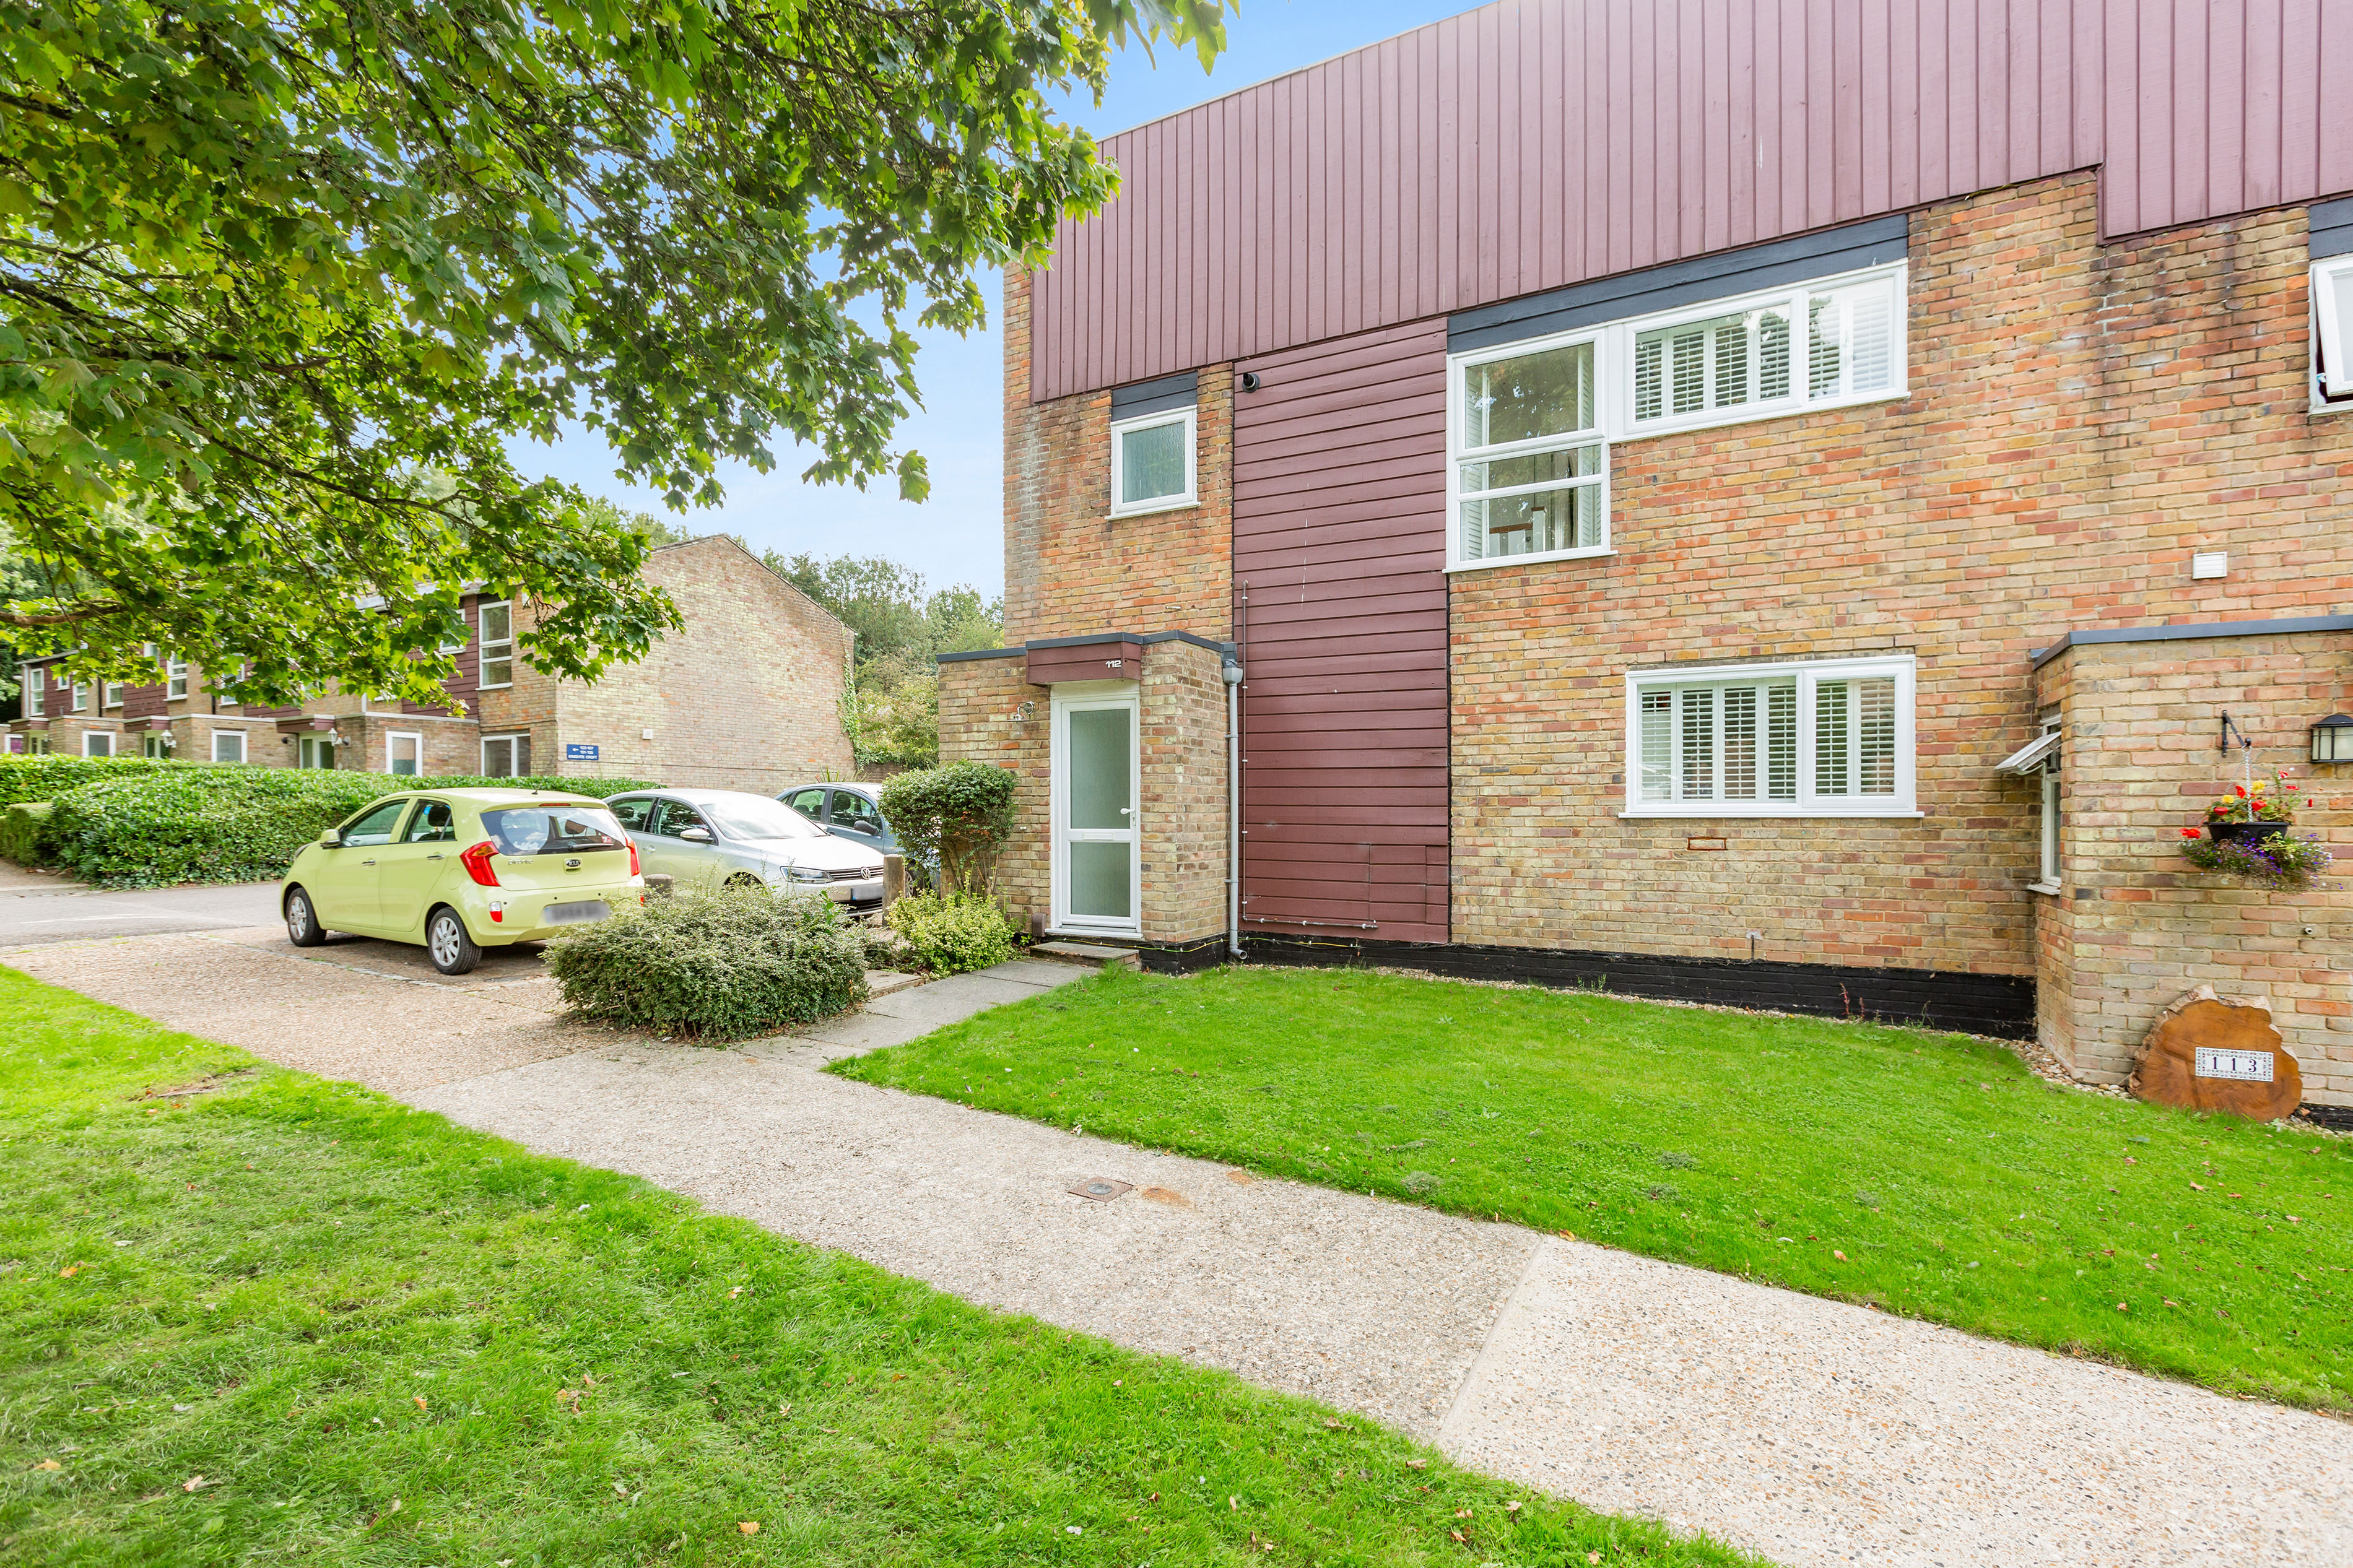 New Ash Green - £365,000